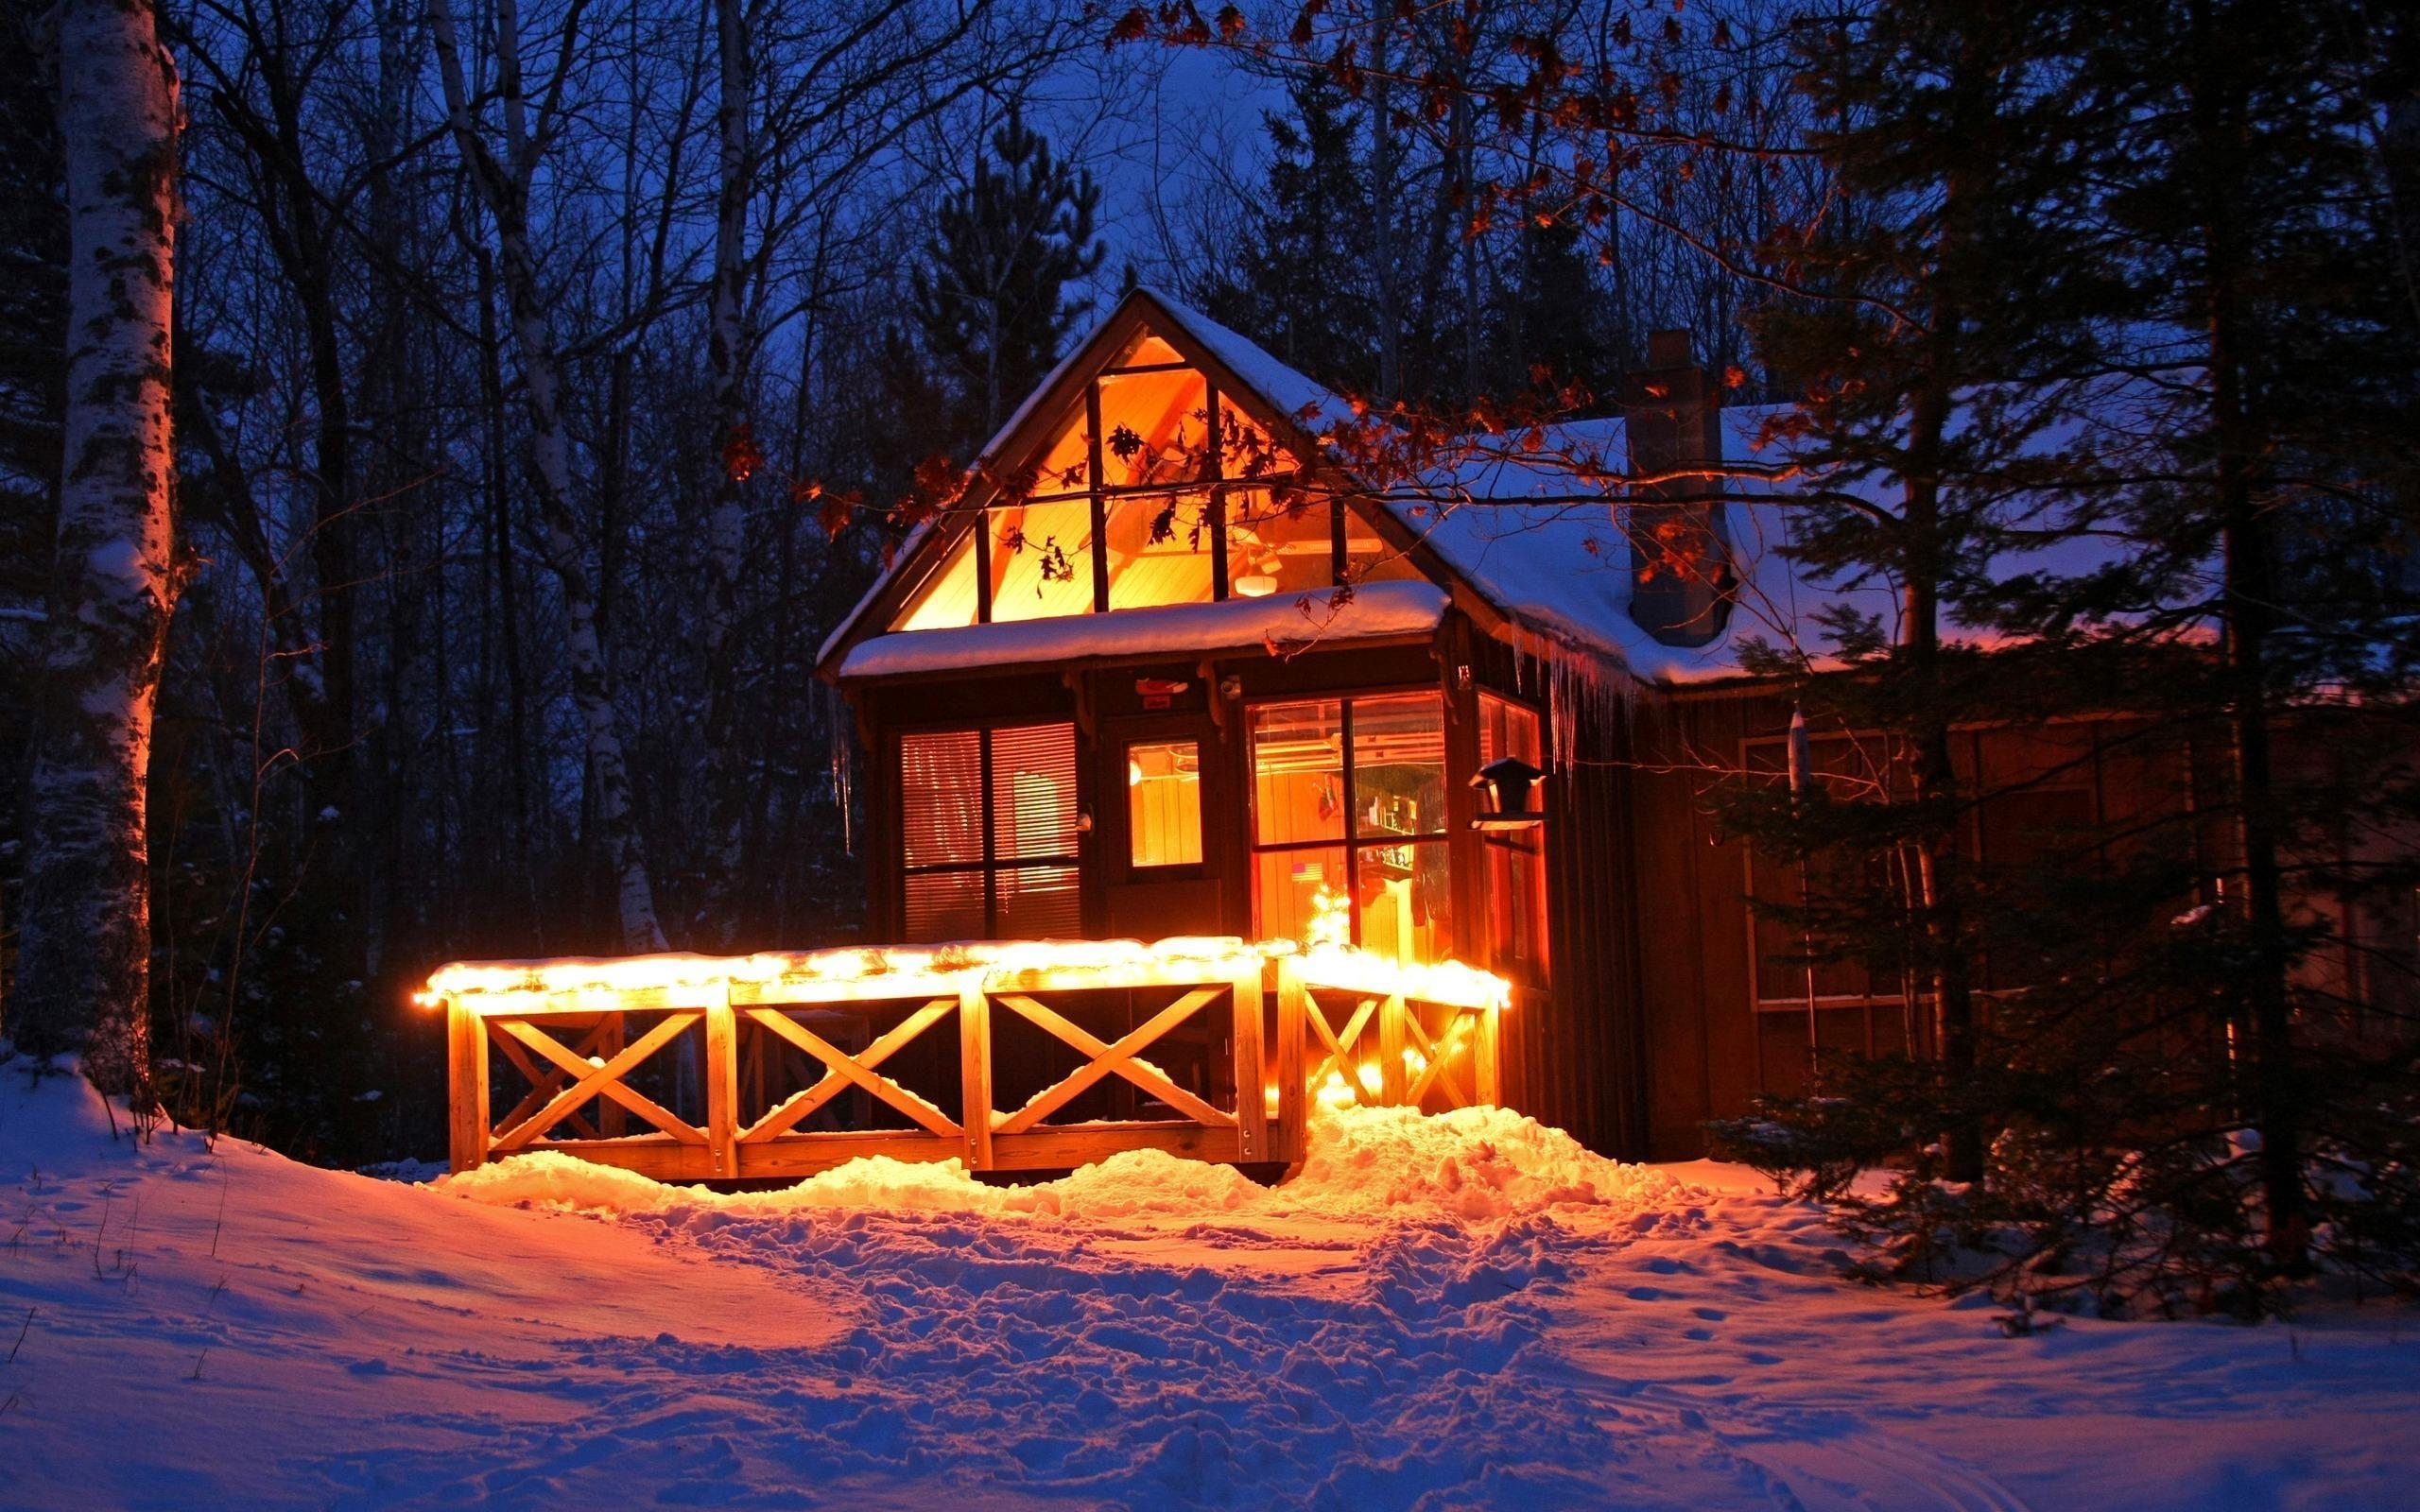 old cabin winter scene wallpaper - photo #19